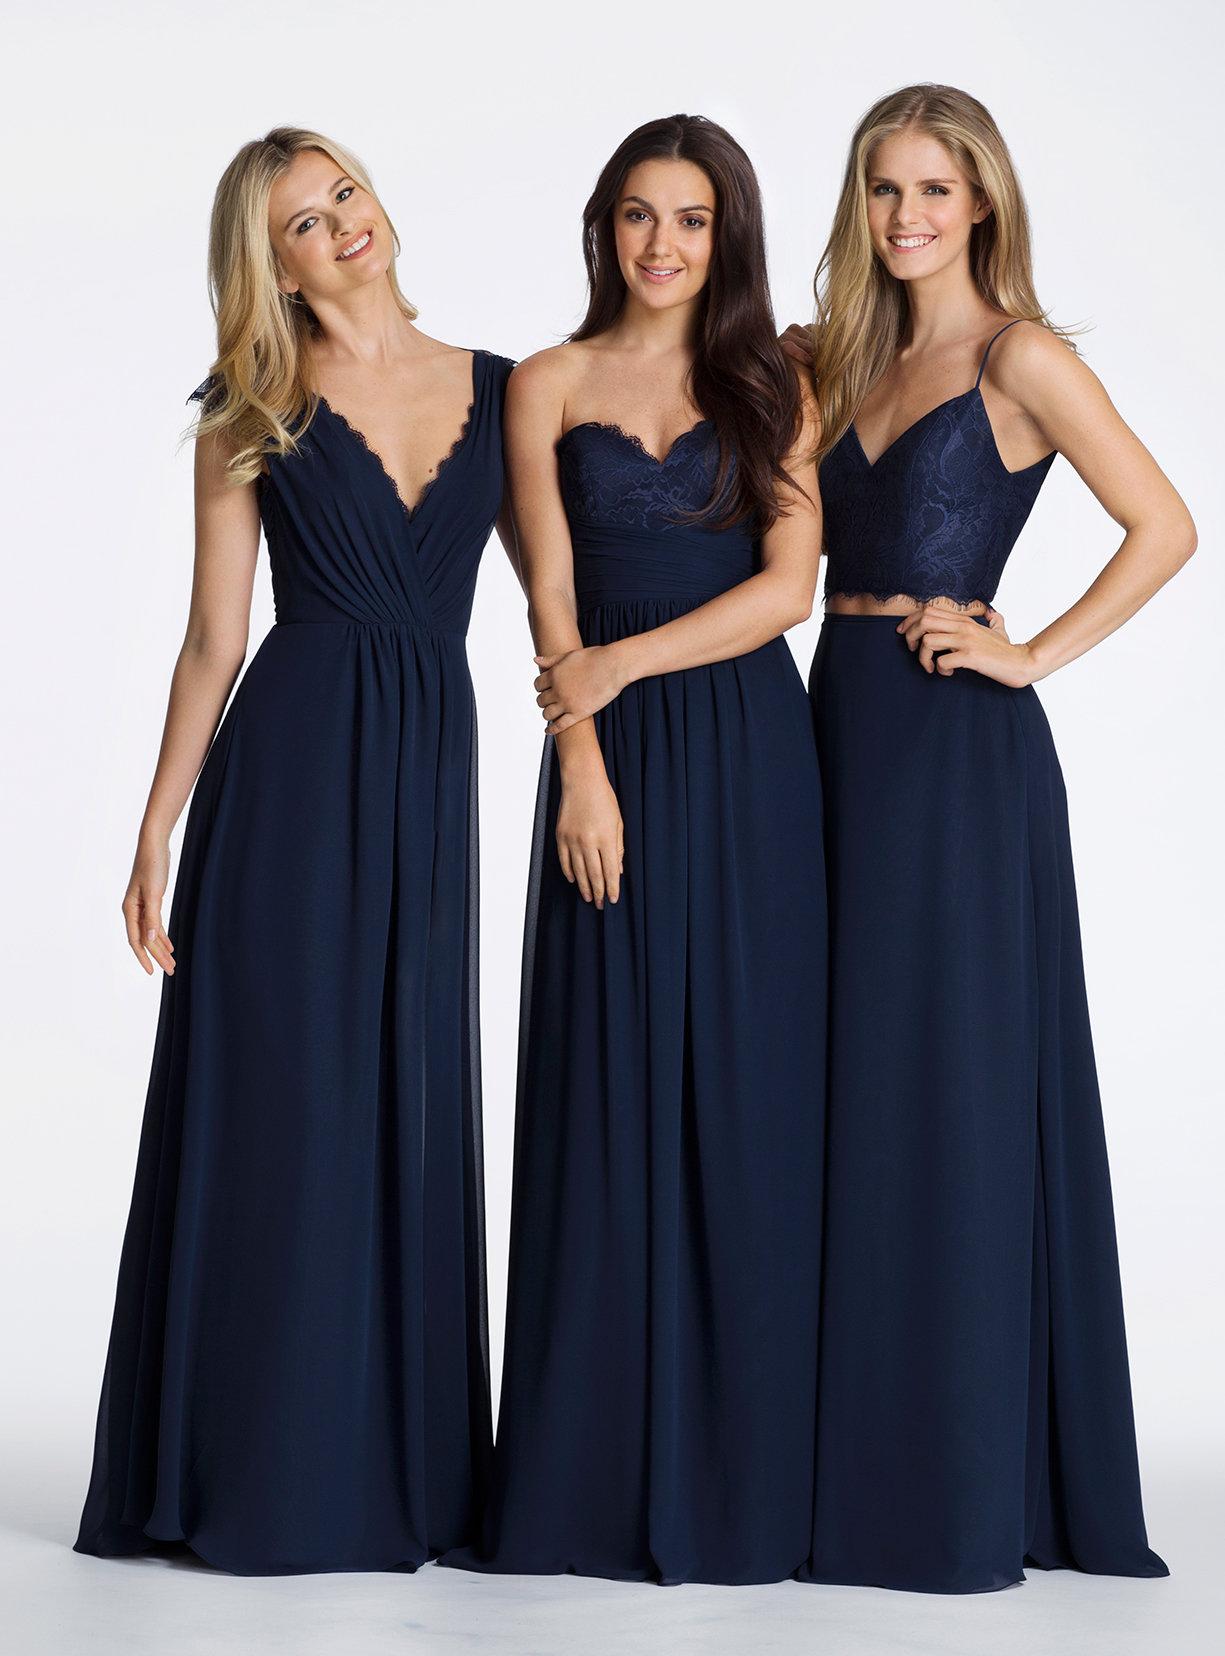 Styles of long bridesmaid dresses